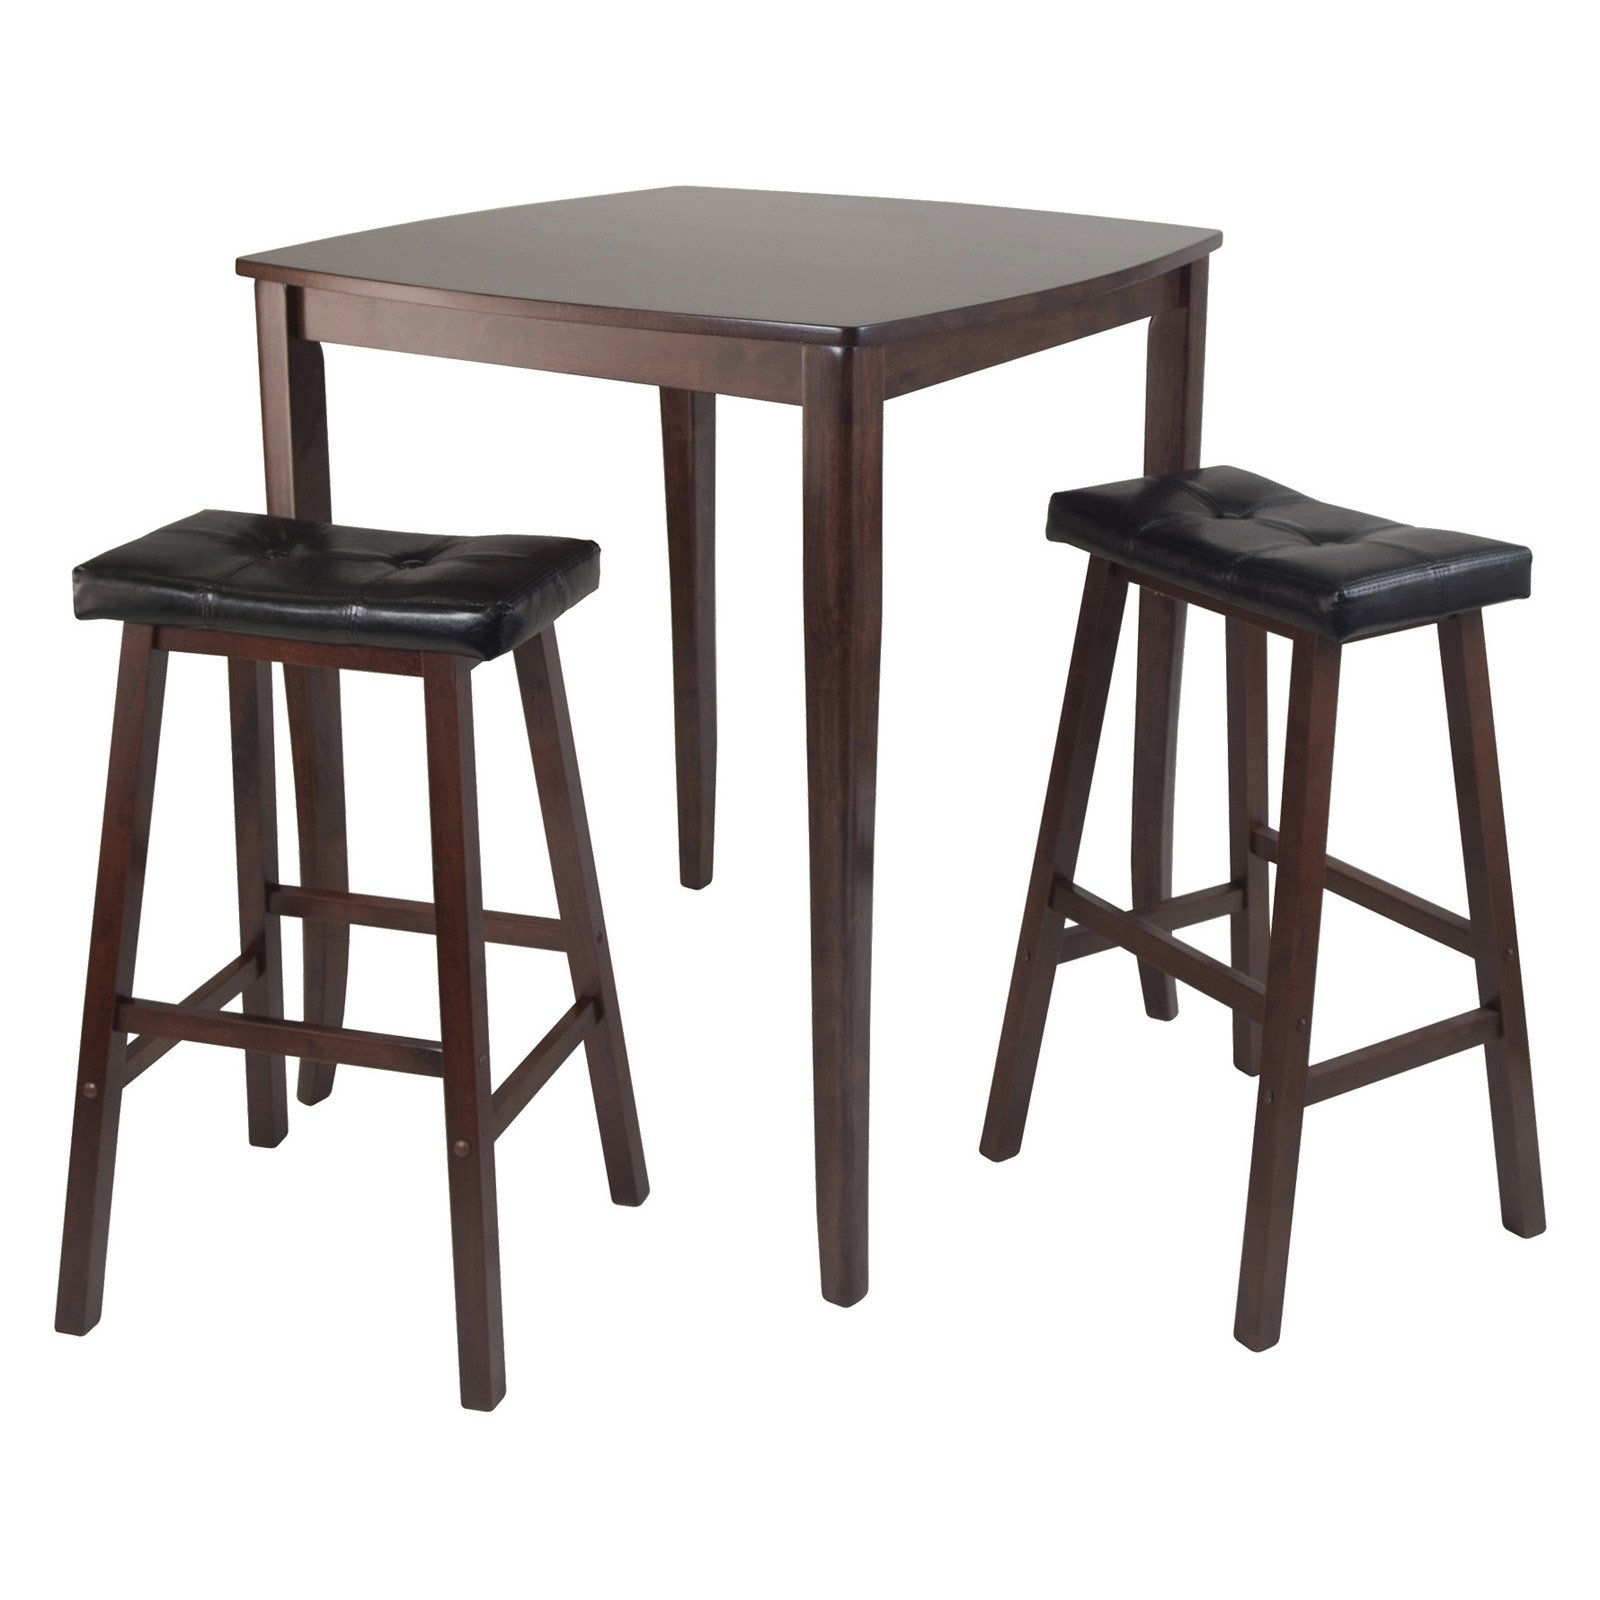 3-Pc Inglewood High/Pub Dining Table with Cushioned Saddle Stool